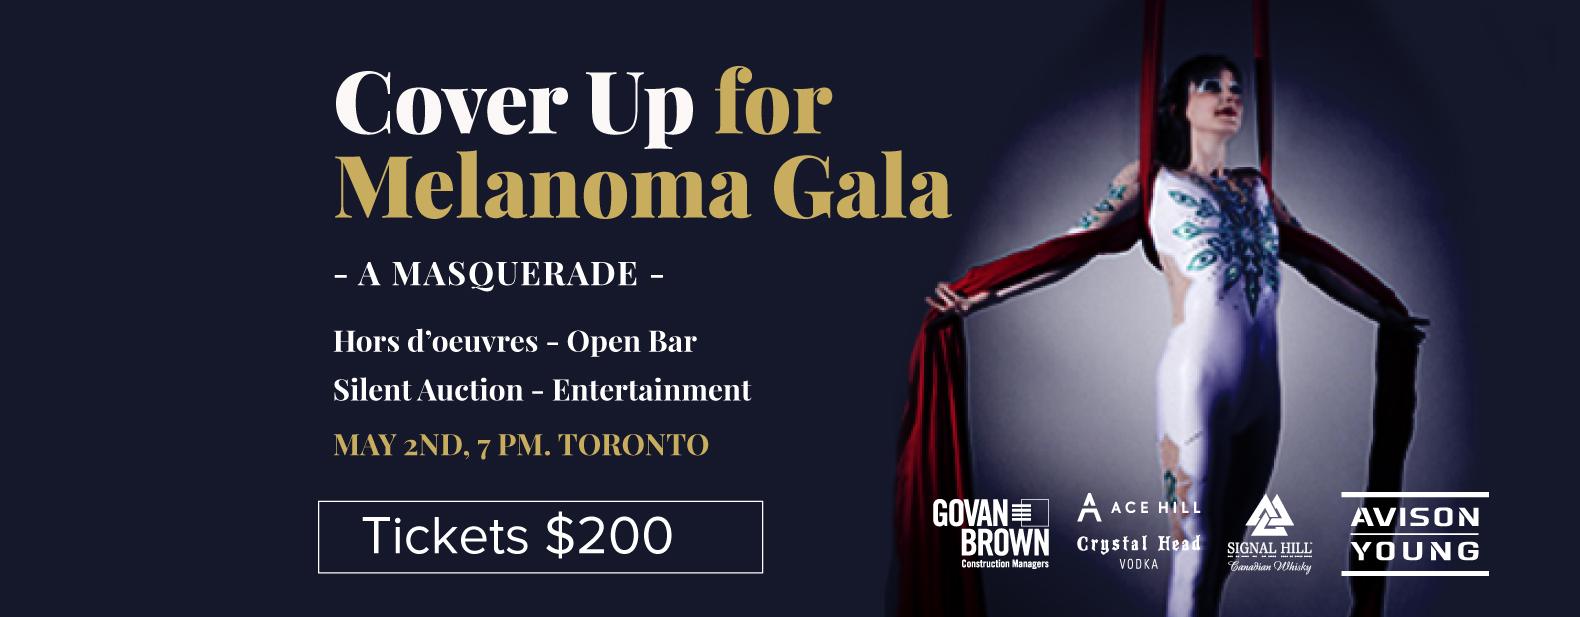 Cover Up for Melanoma Gala